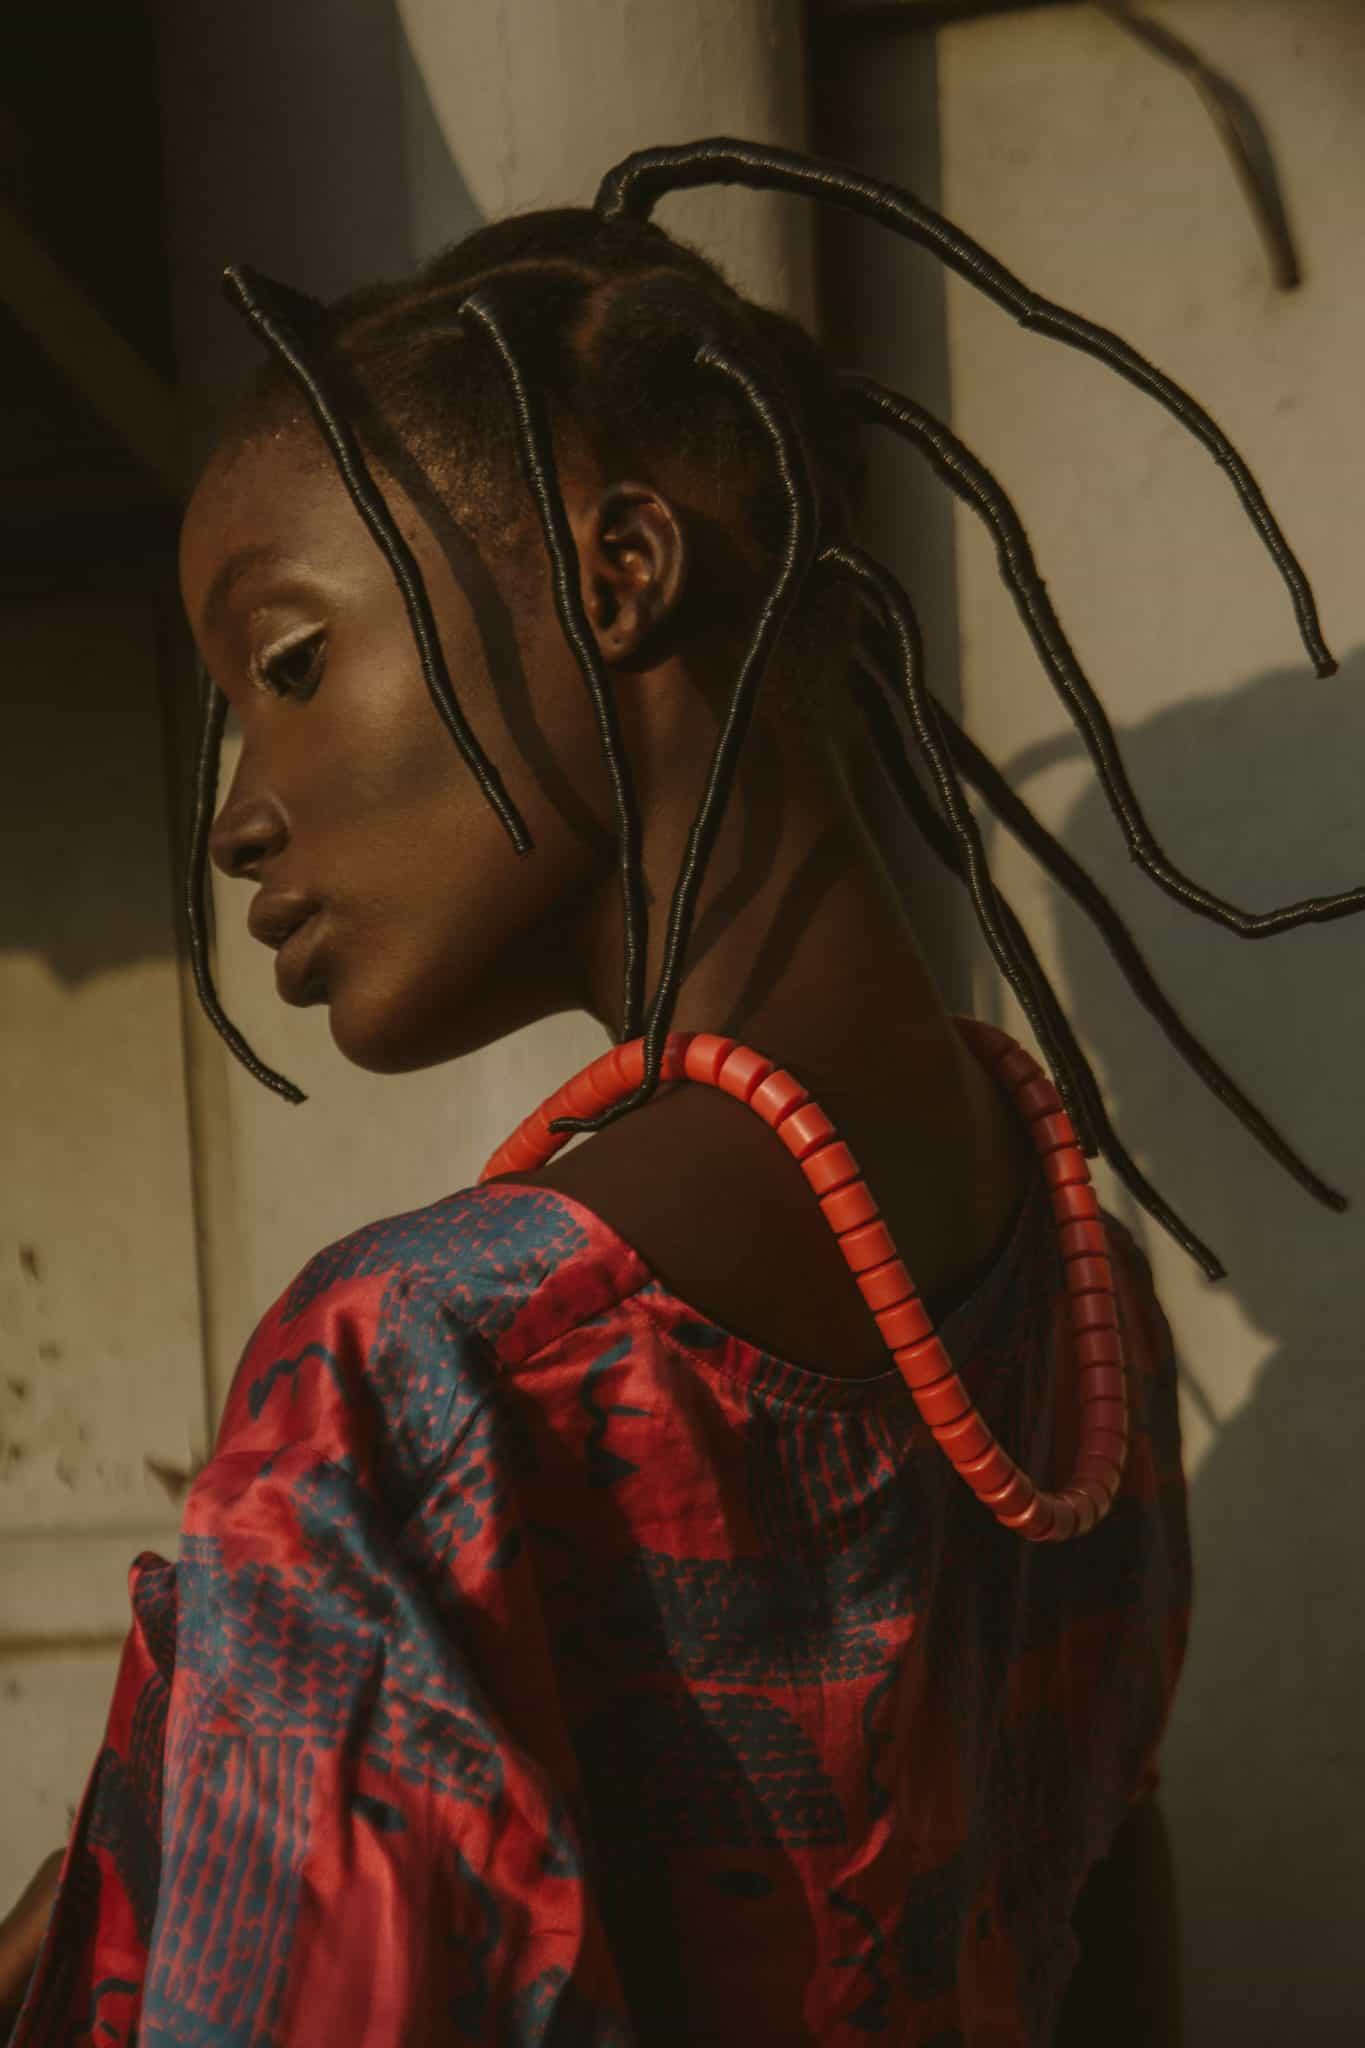 AV Club: Daniel Obasi's new fashion film is a facile narrative about gender in Nigeria